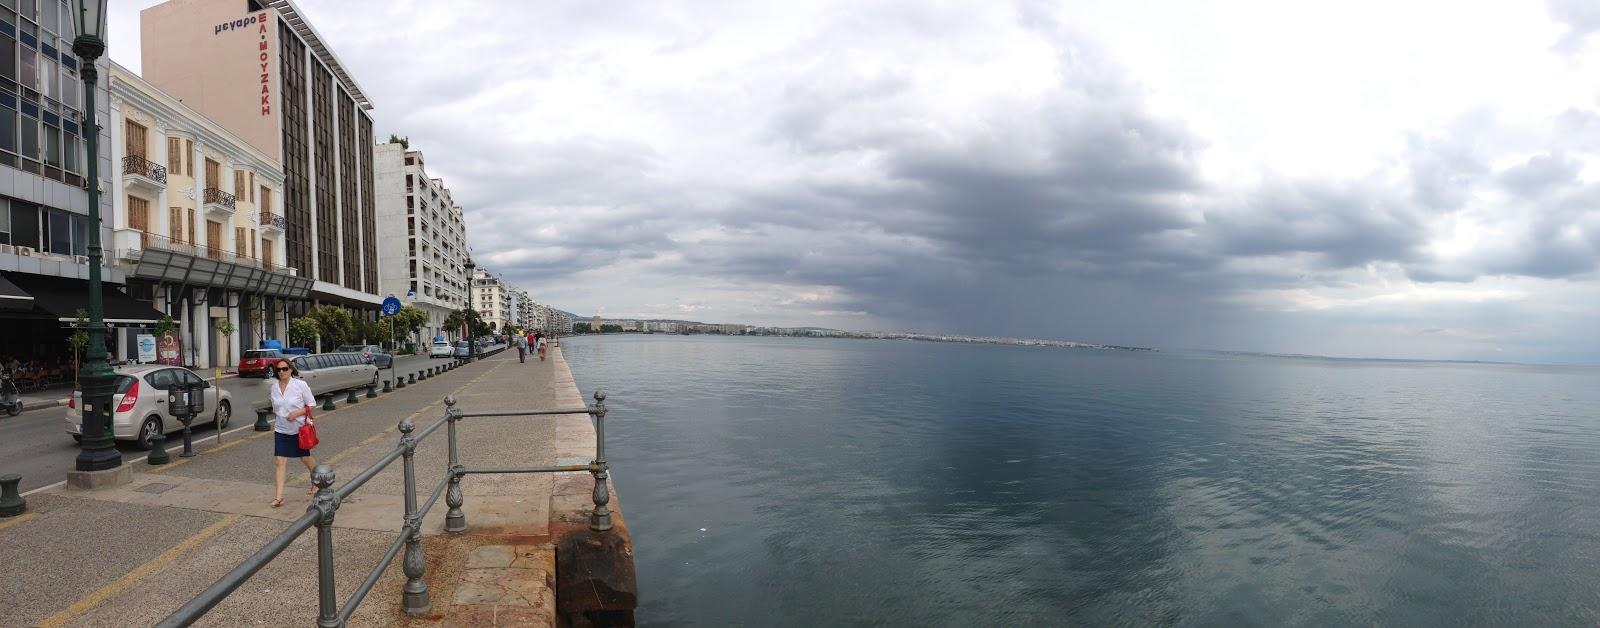 Day 19 - 2013-06-12 - Thessaloniki - IMG_1204.JPG